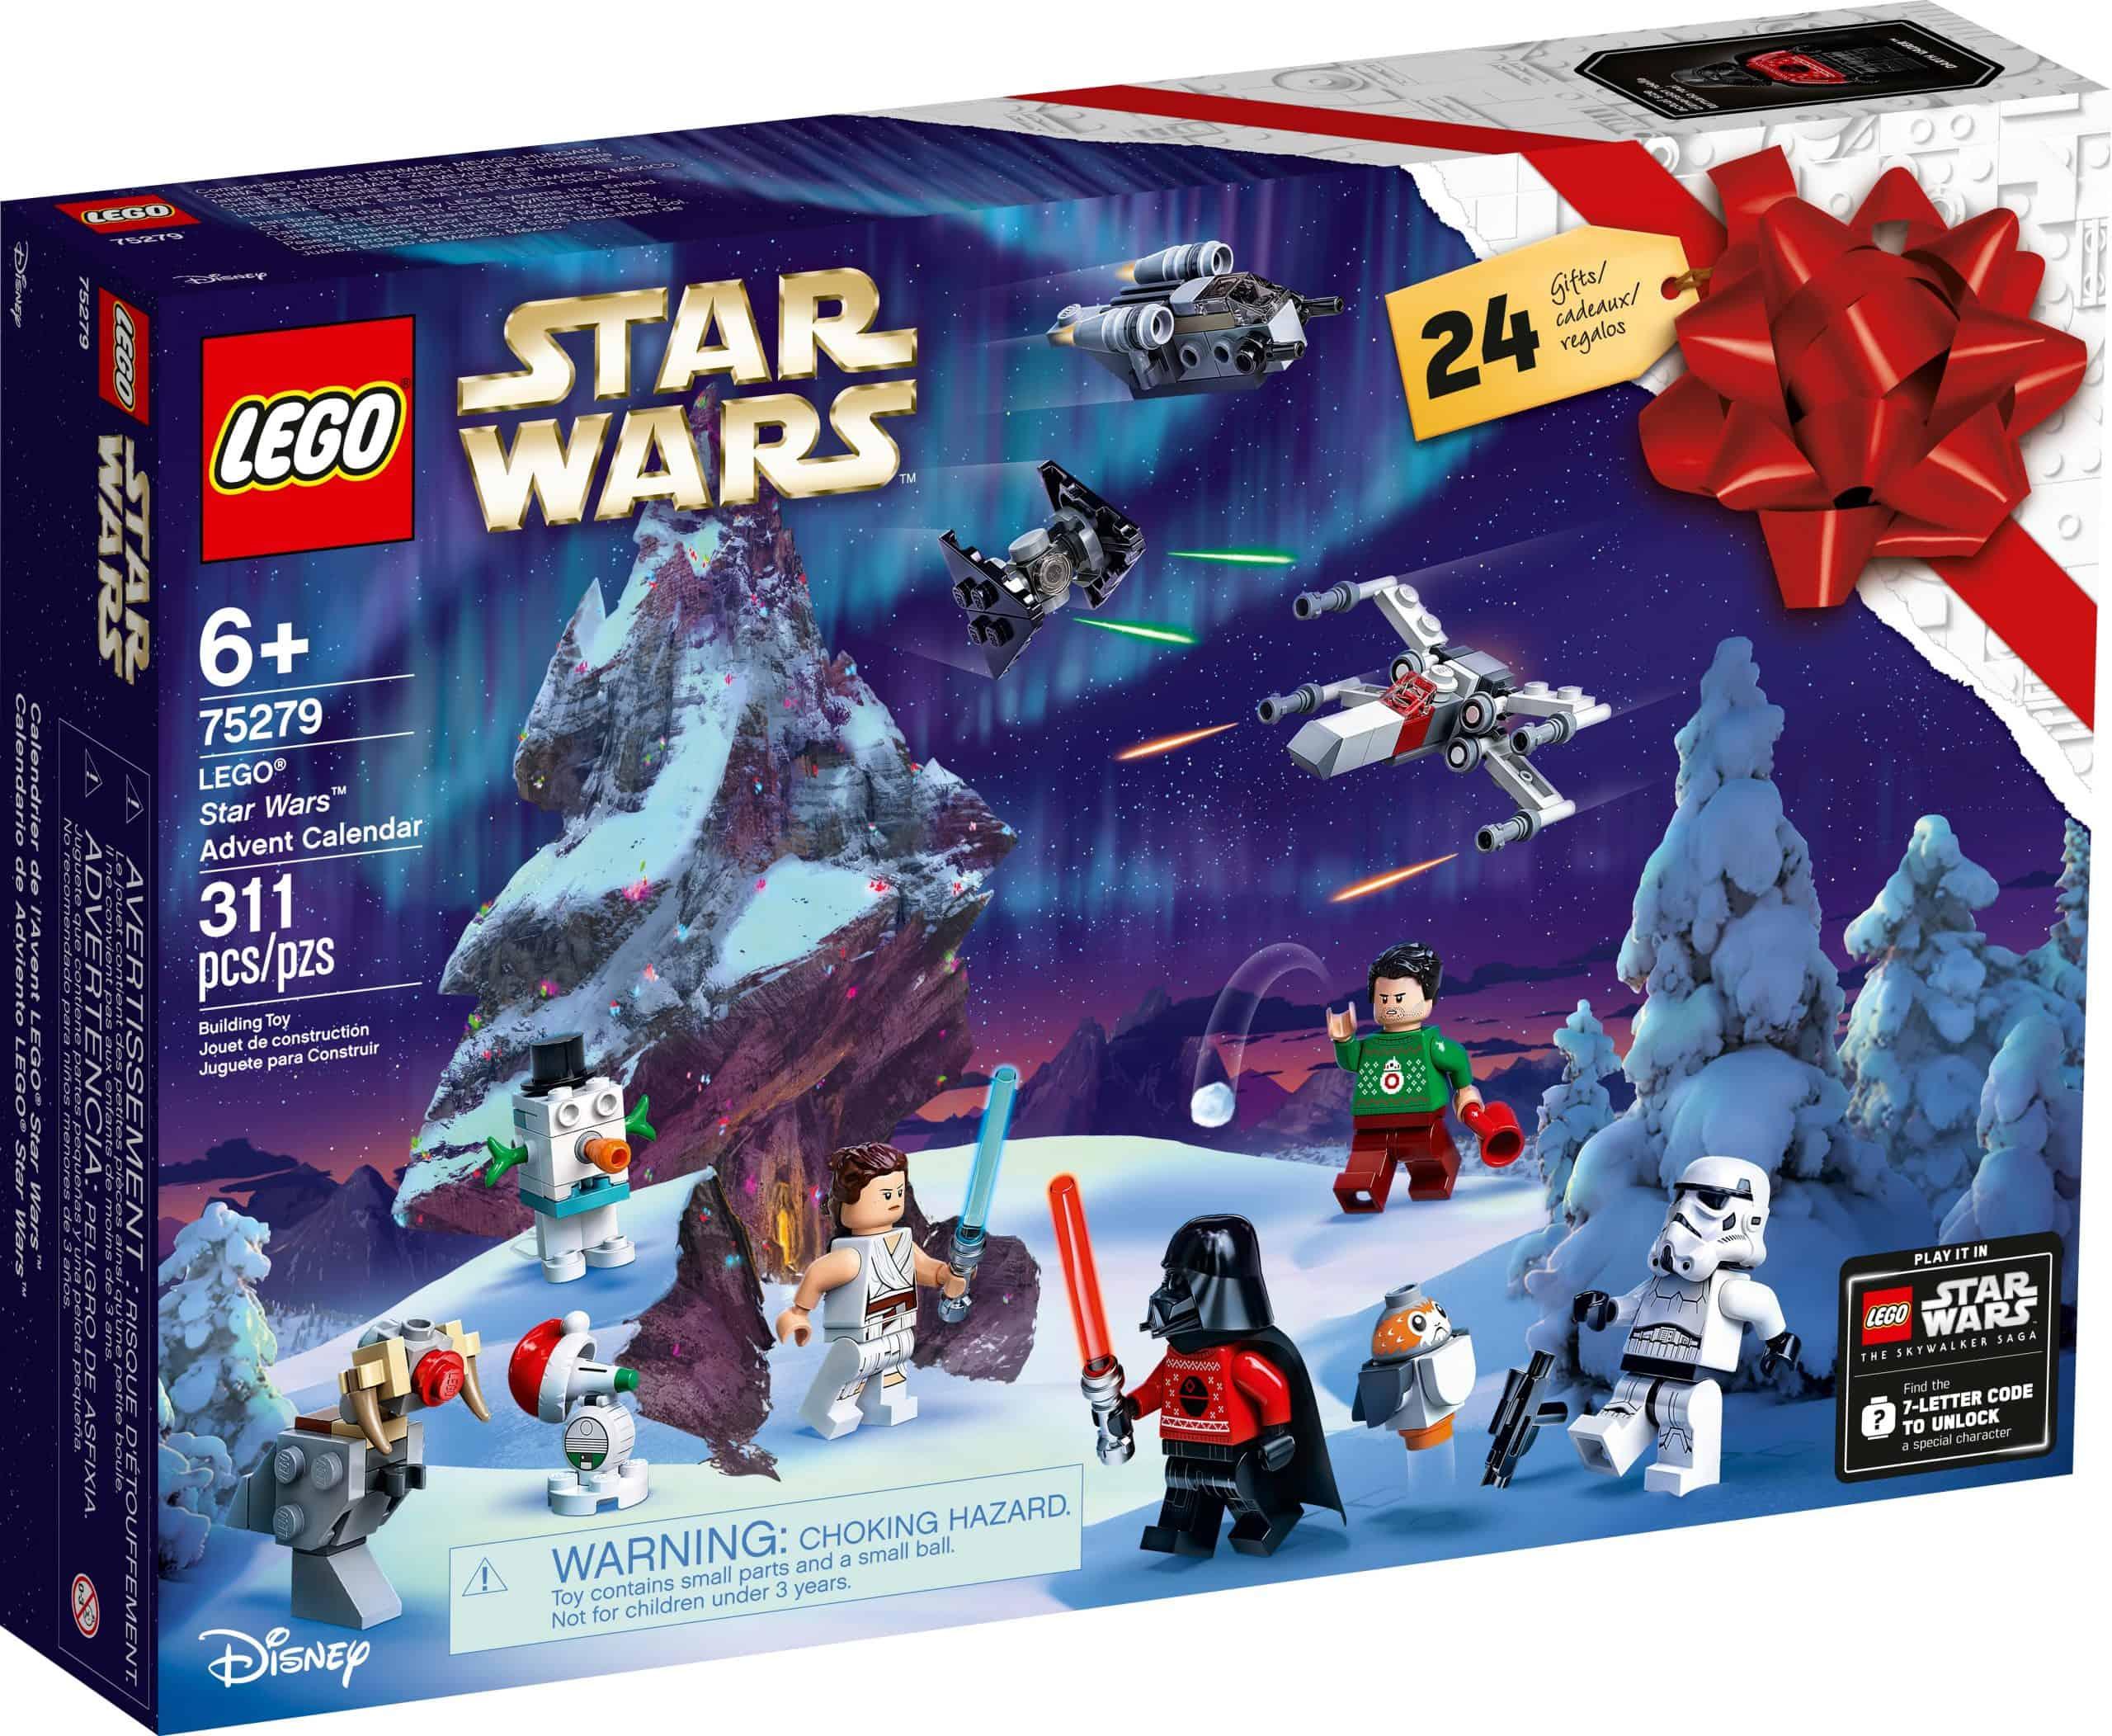 LEGO 75279 Star Wars adventkalender